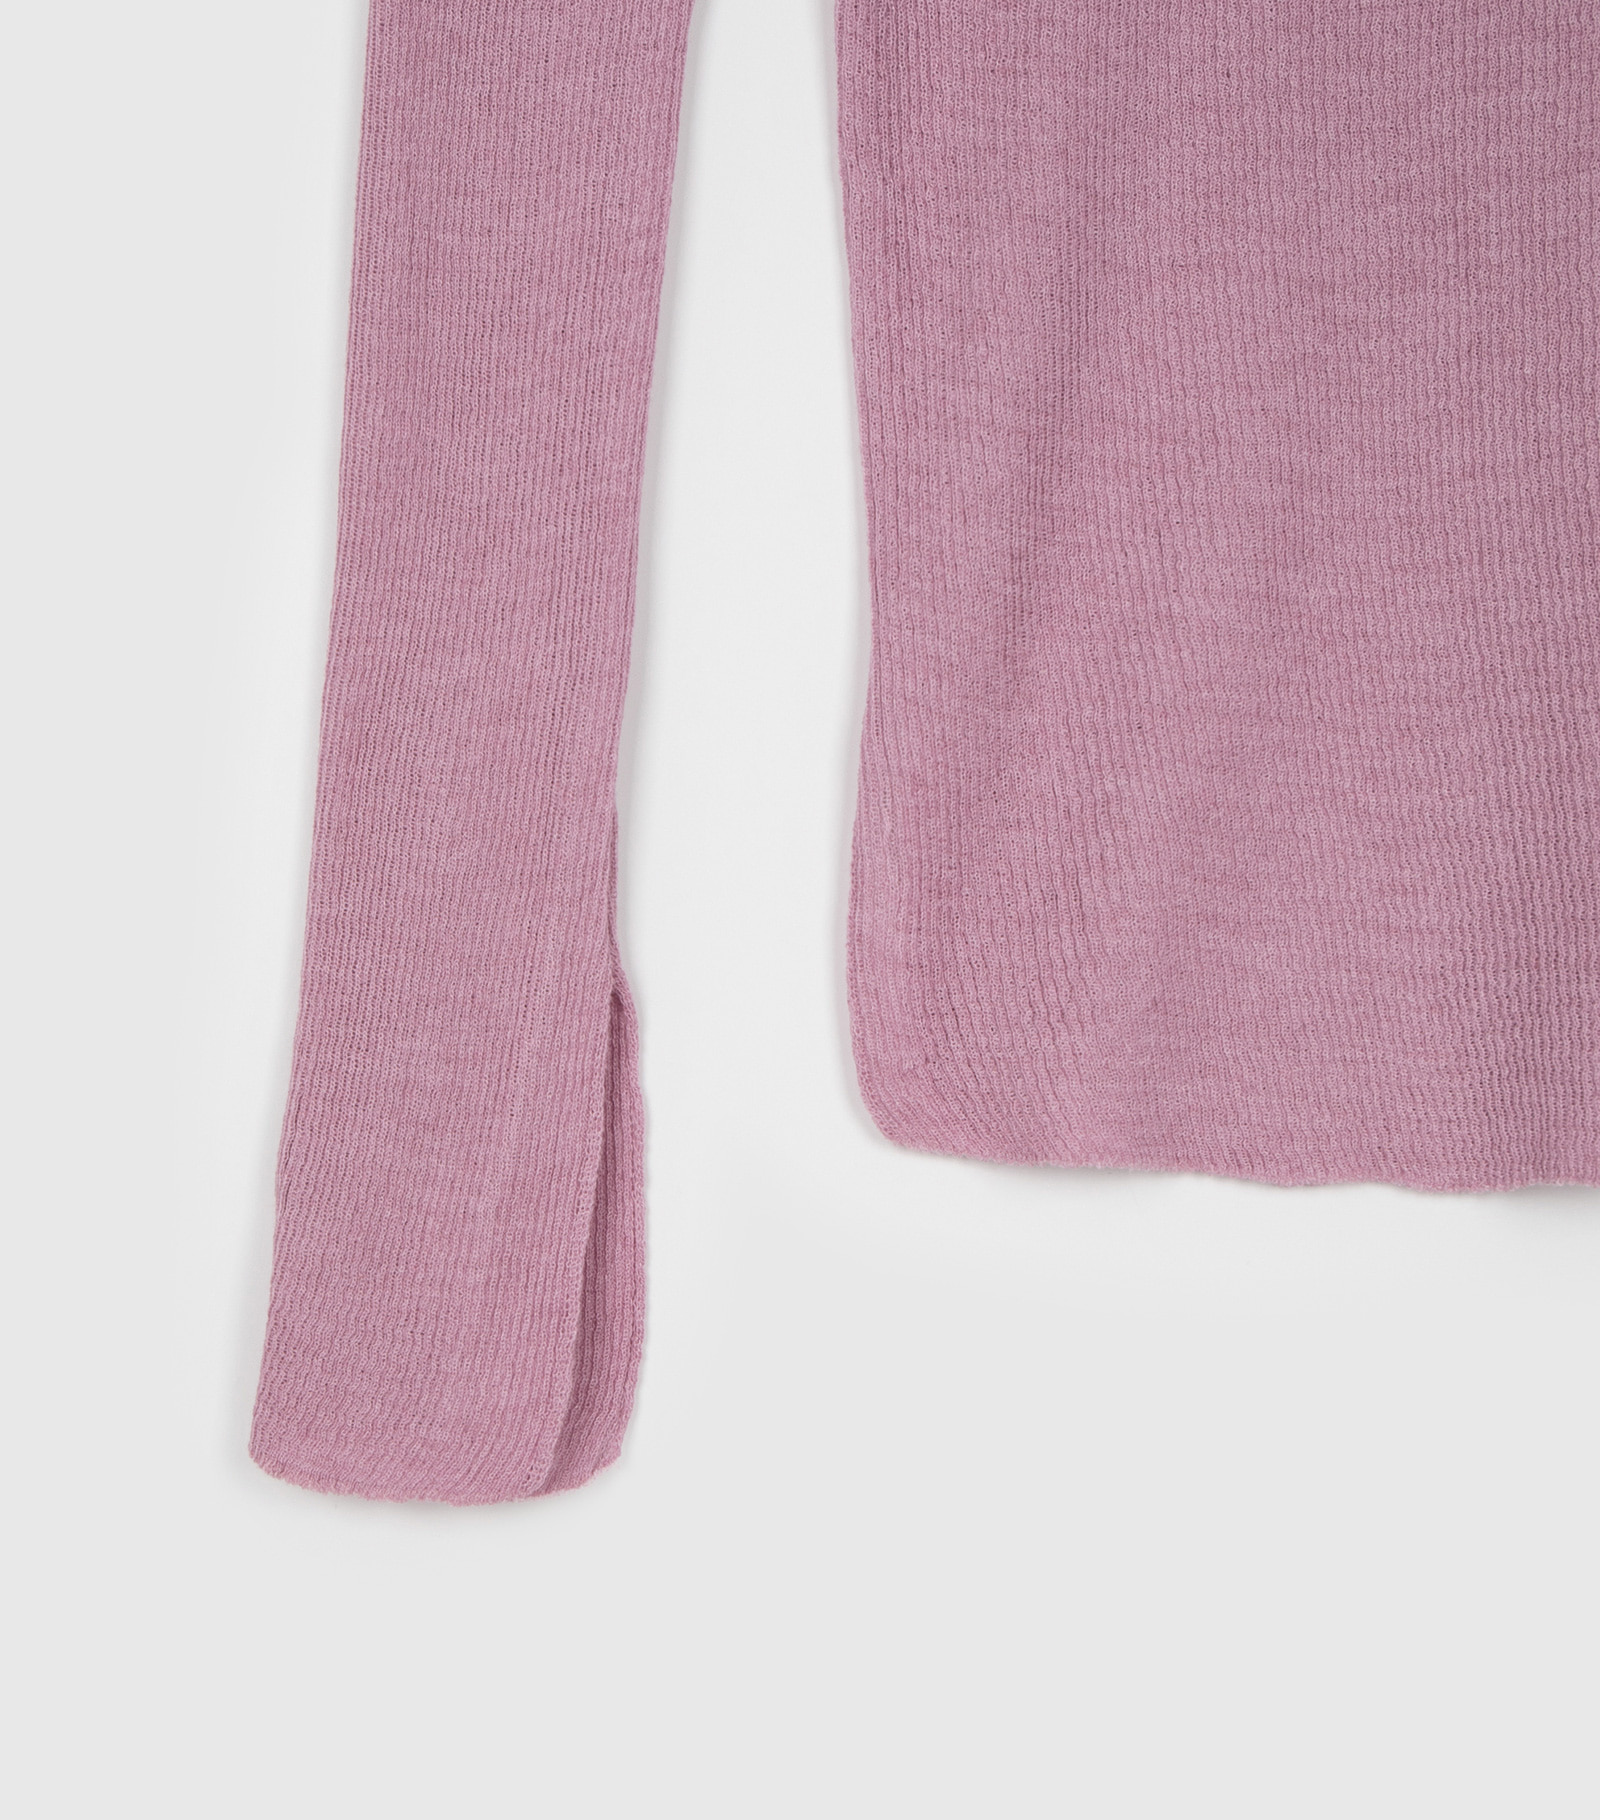 Avant Linen One Off Shoulder Knit